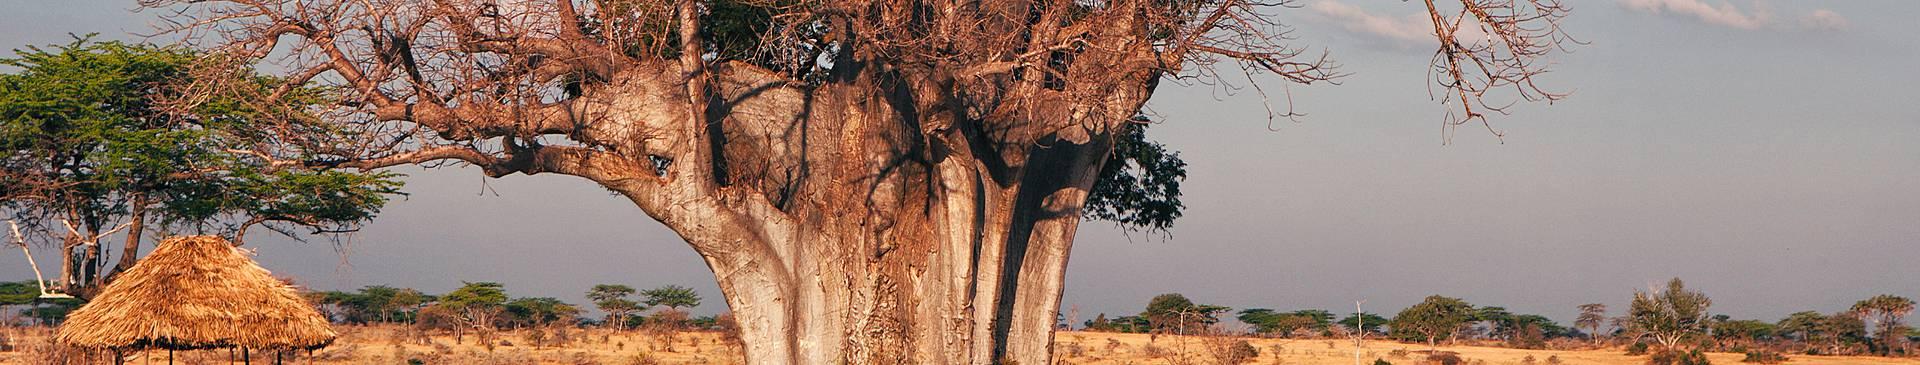 Eine Woche nach Tansania